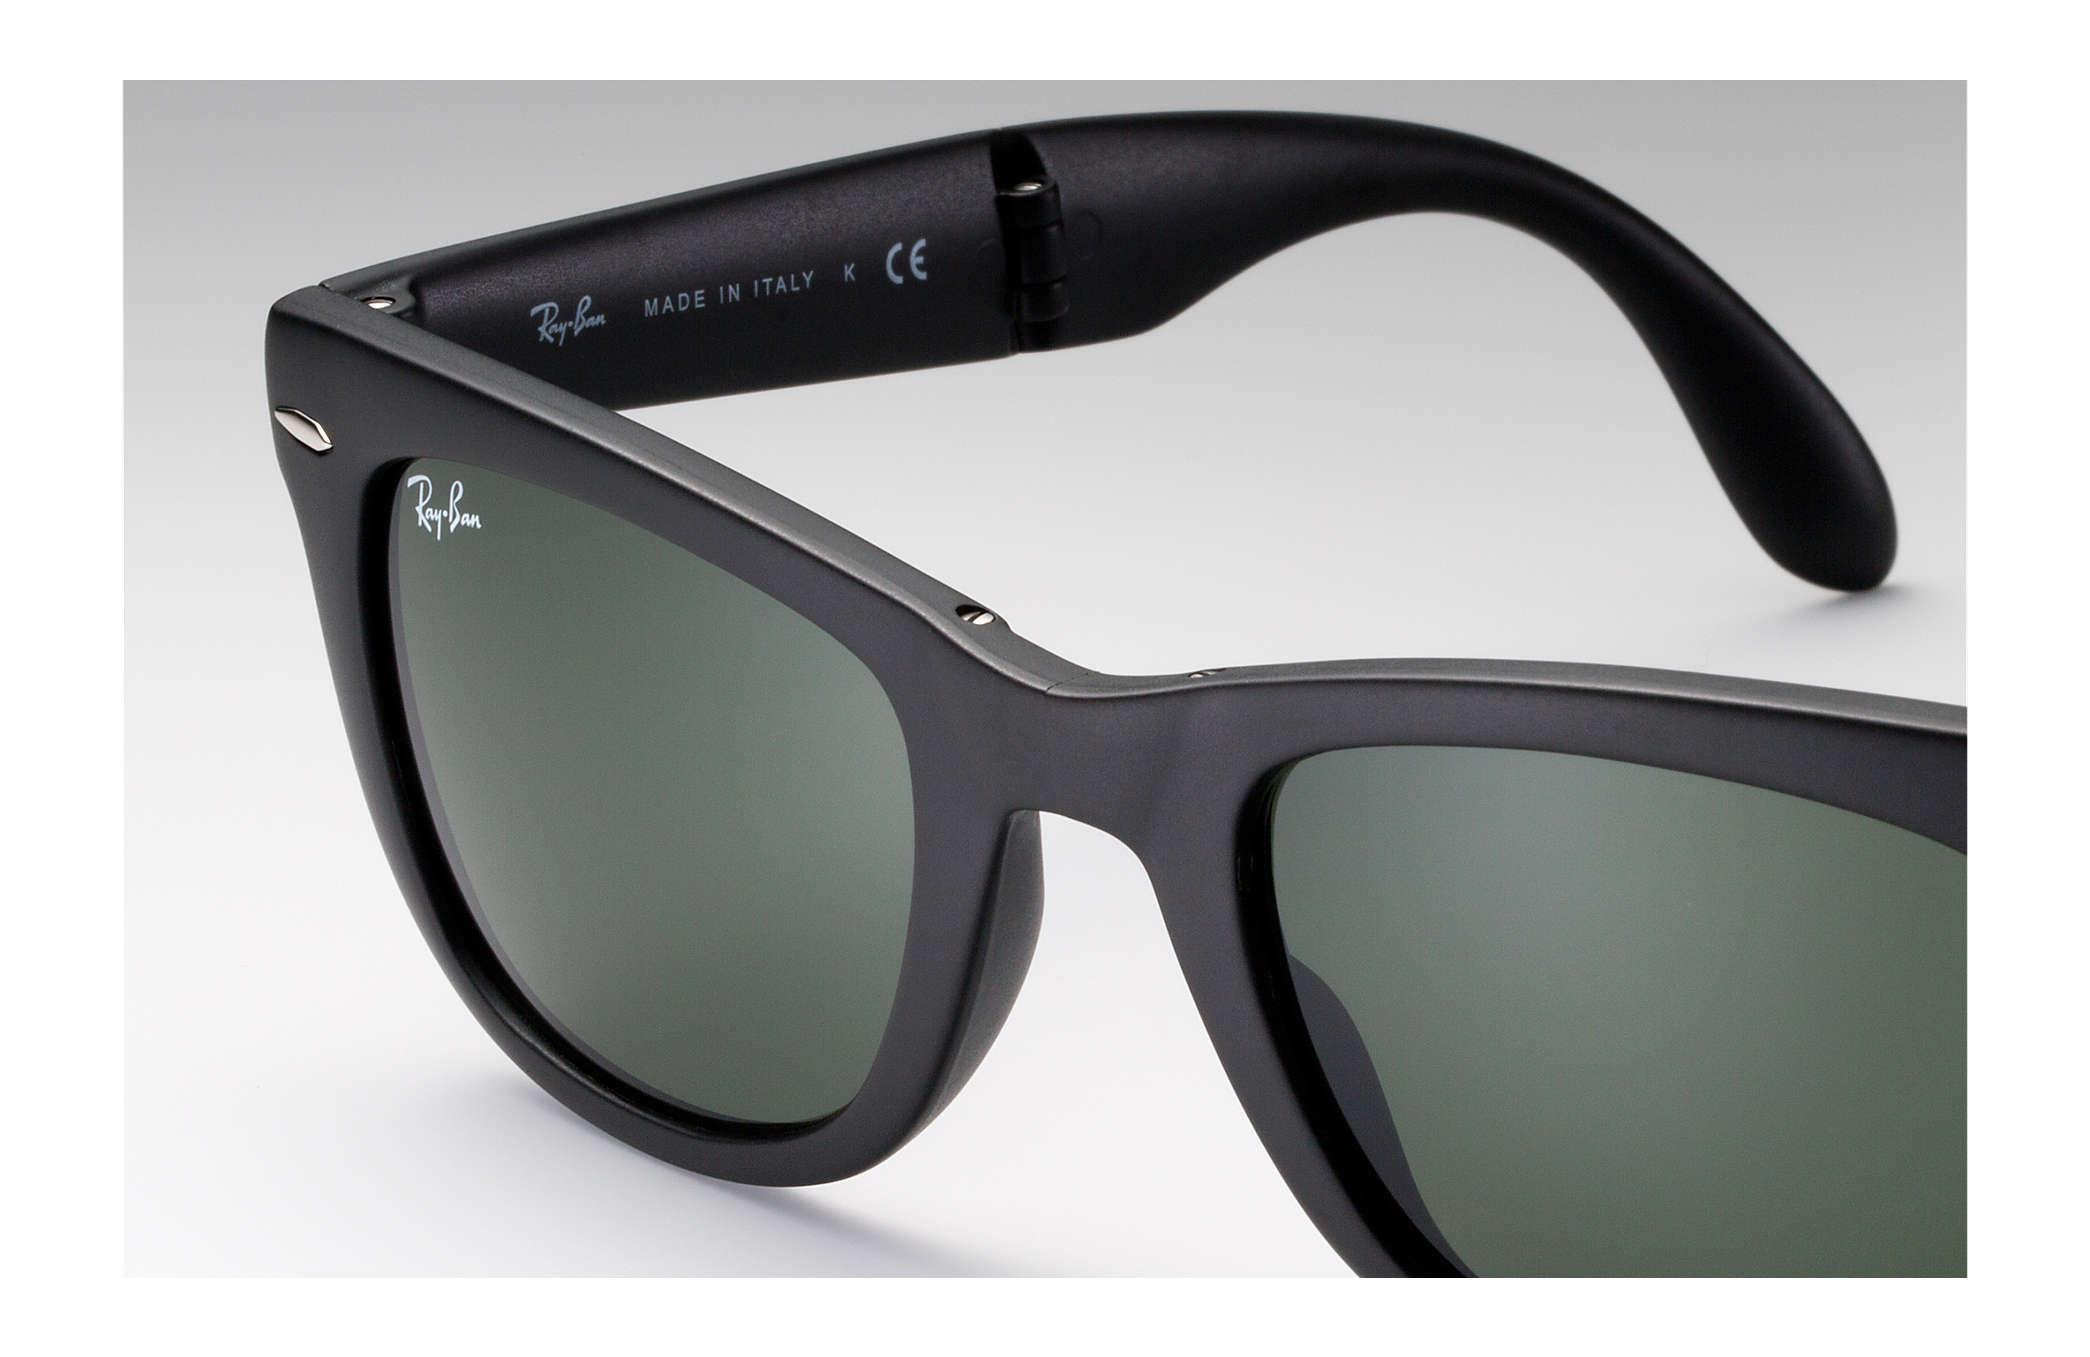 6eb5912ce818f Ray-Ban Wayfarer Folding Classic RB4105 Black - Nylon - Green Lenses ...